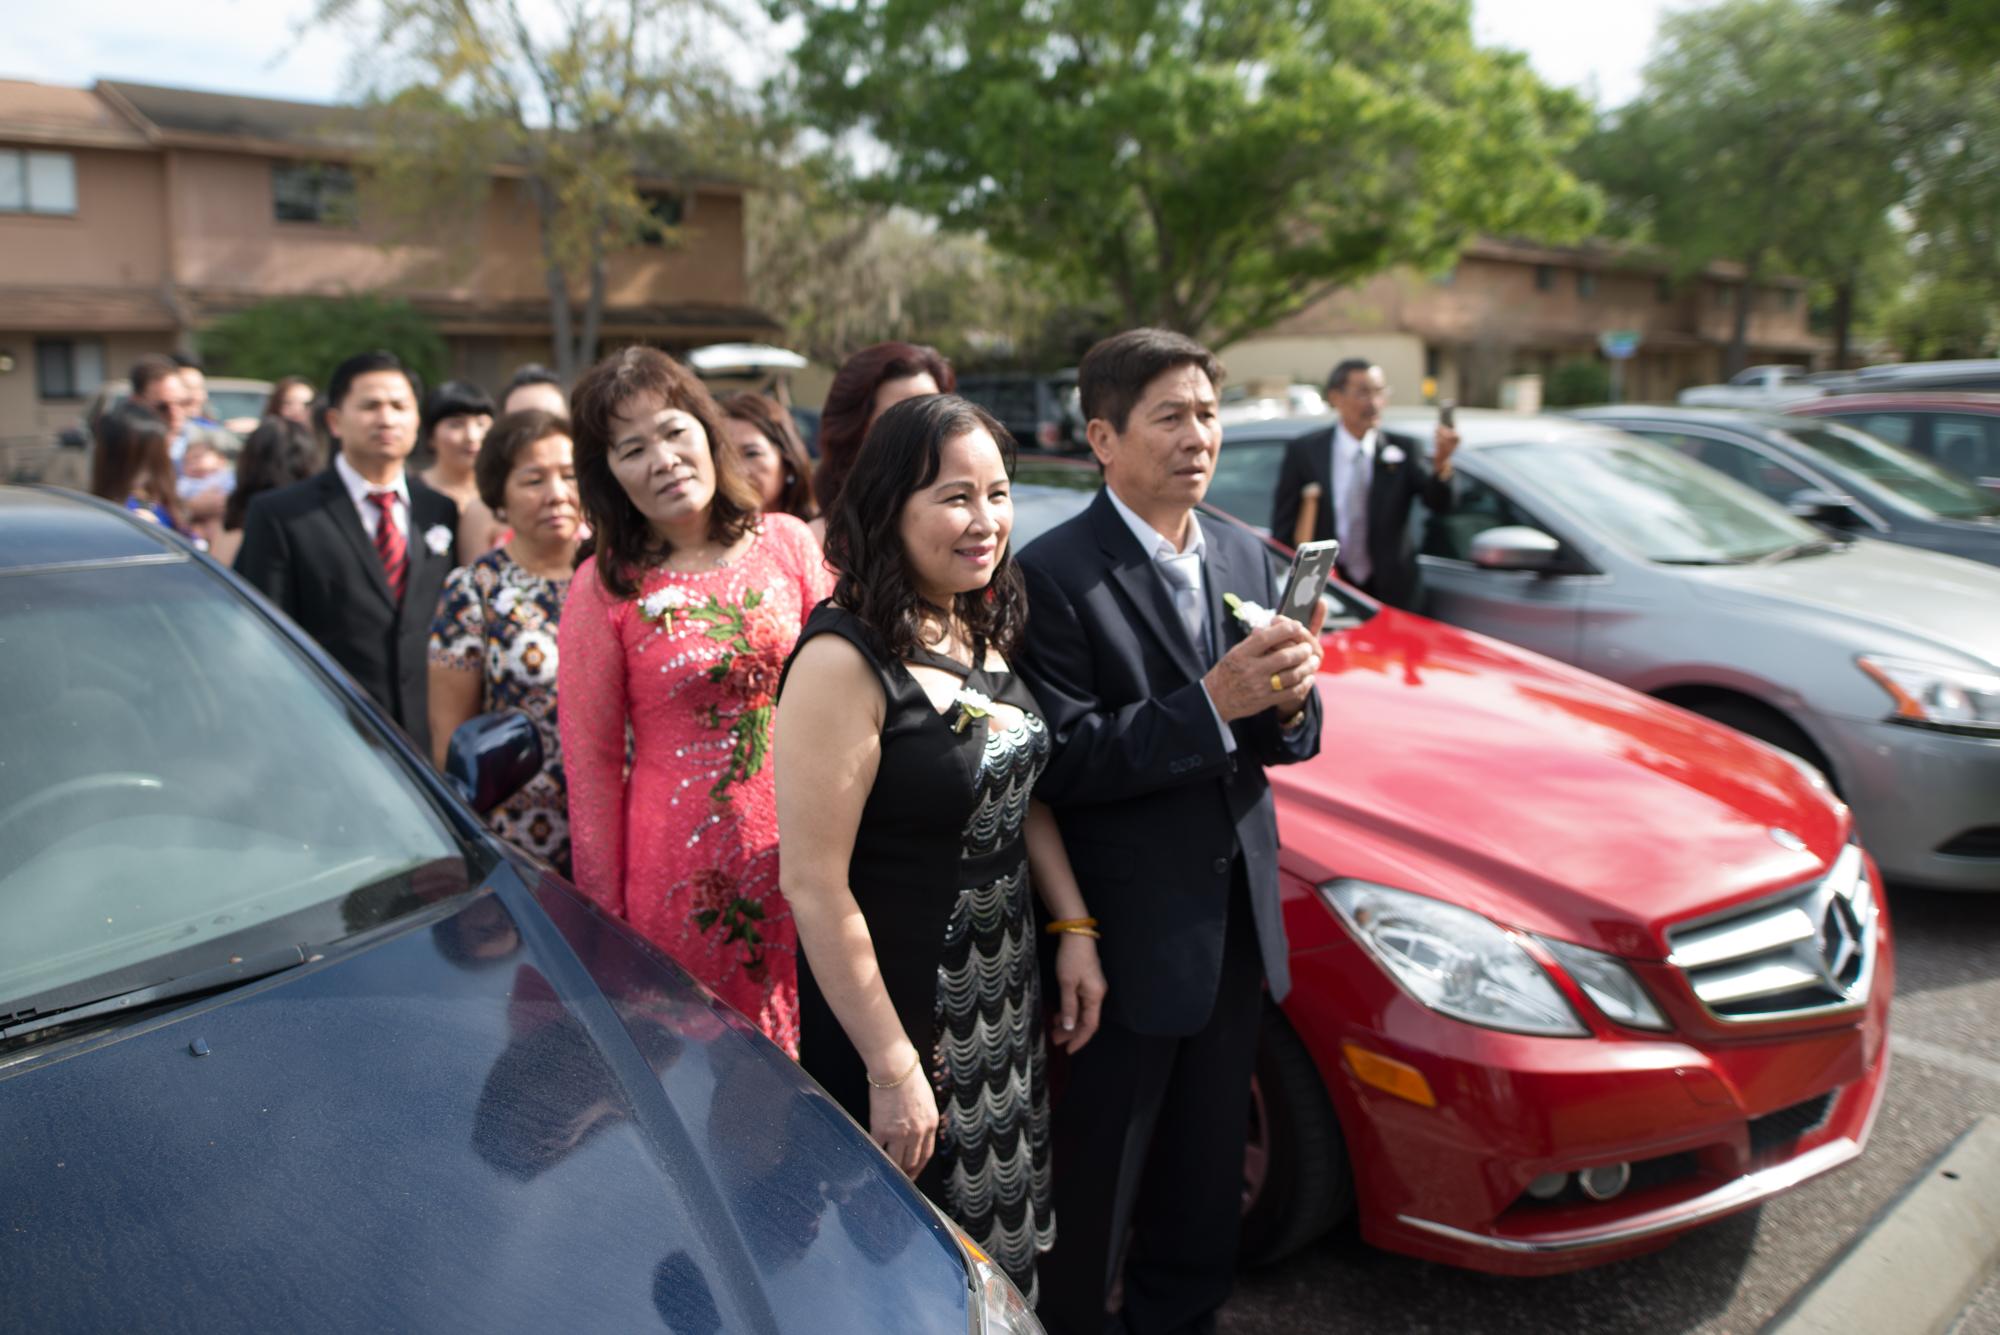 Bride's House - d8e-626.jpg